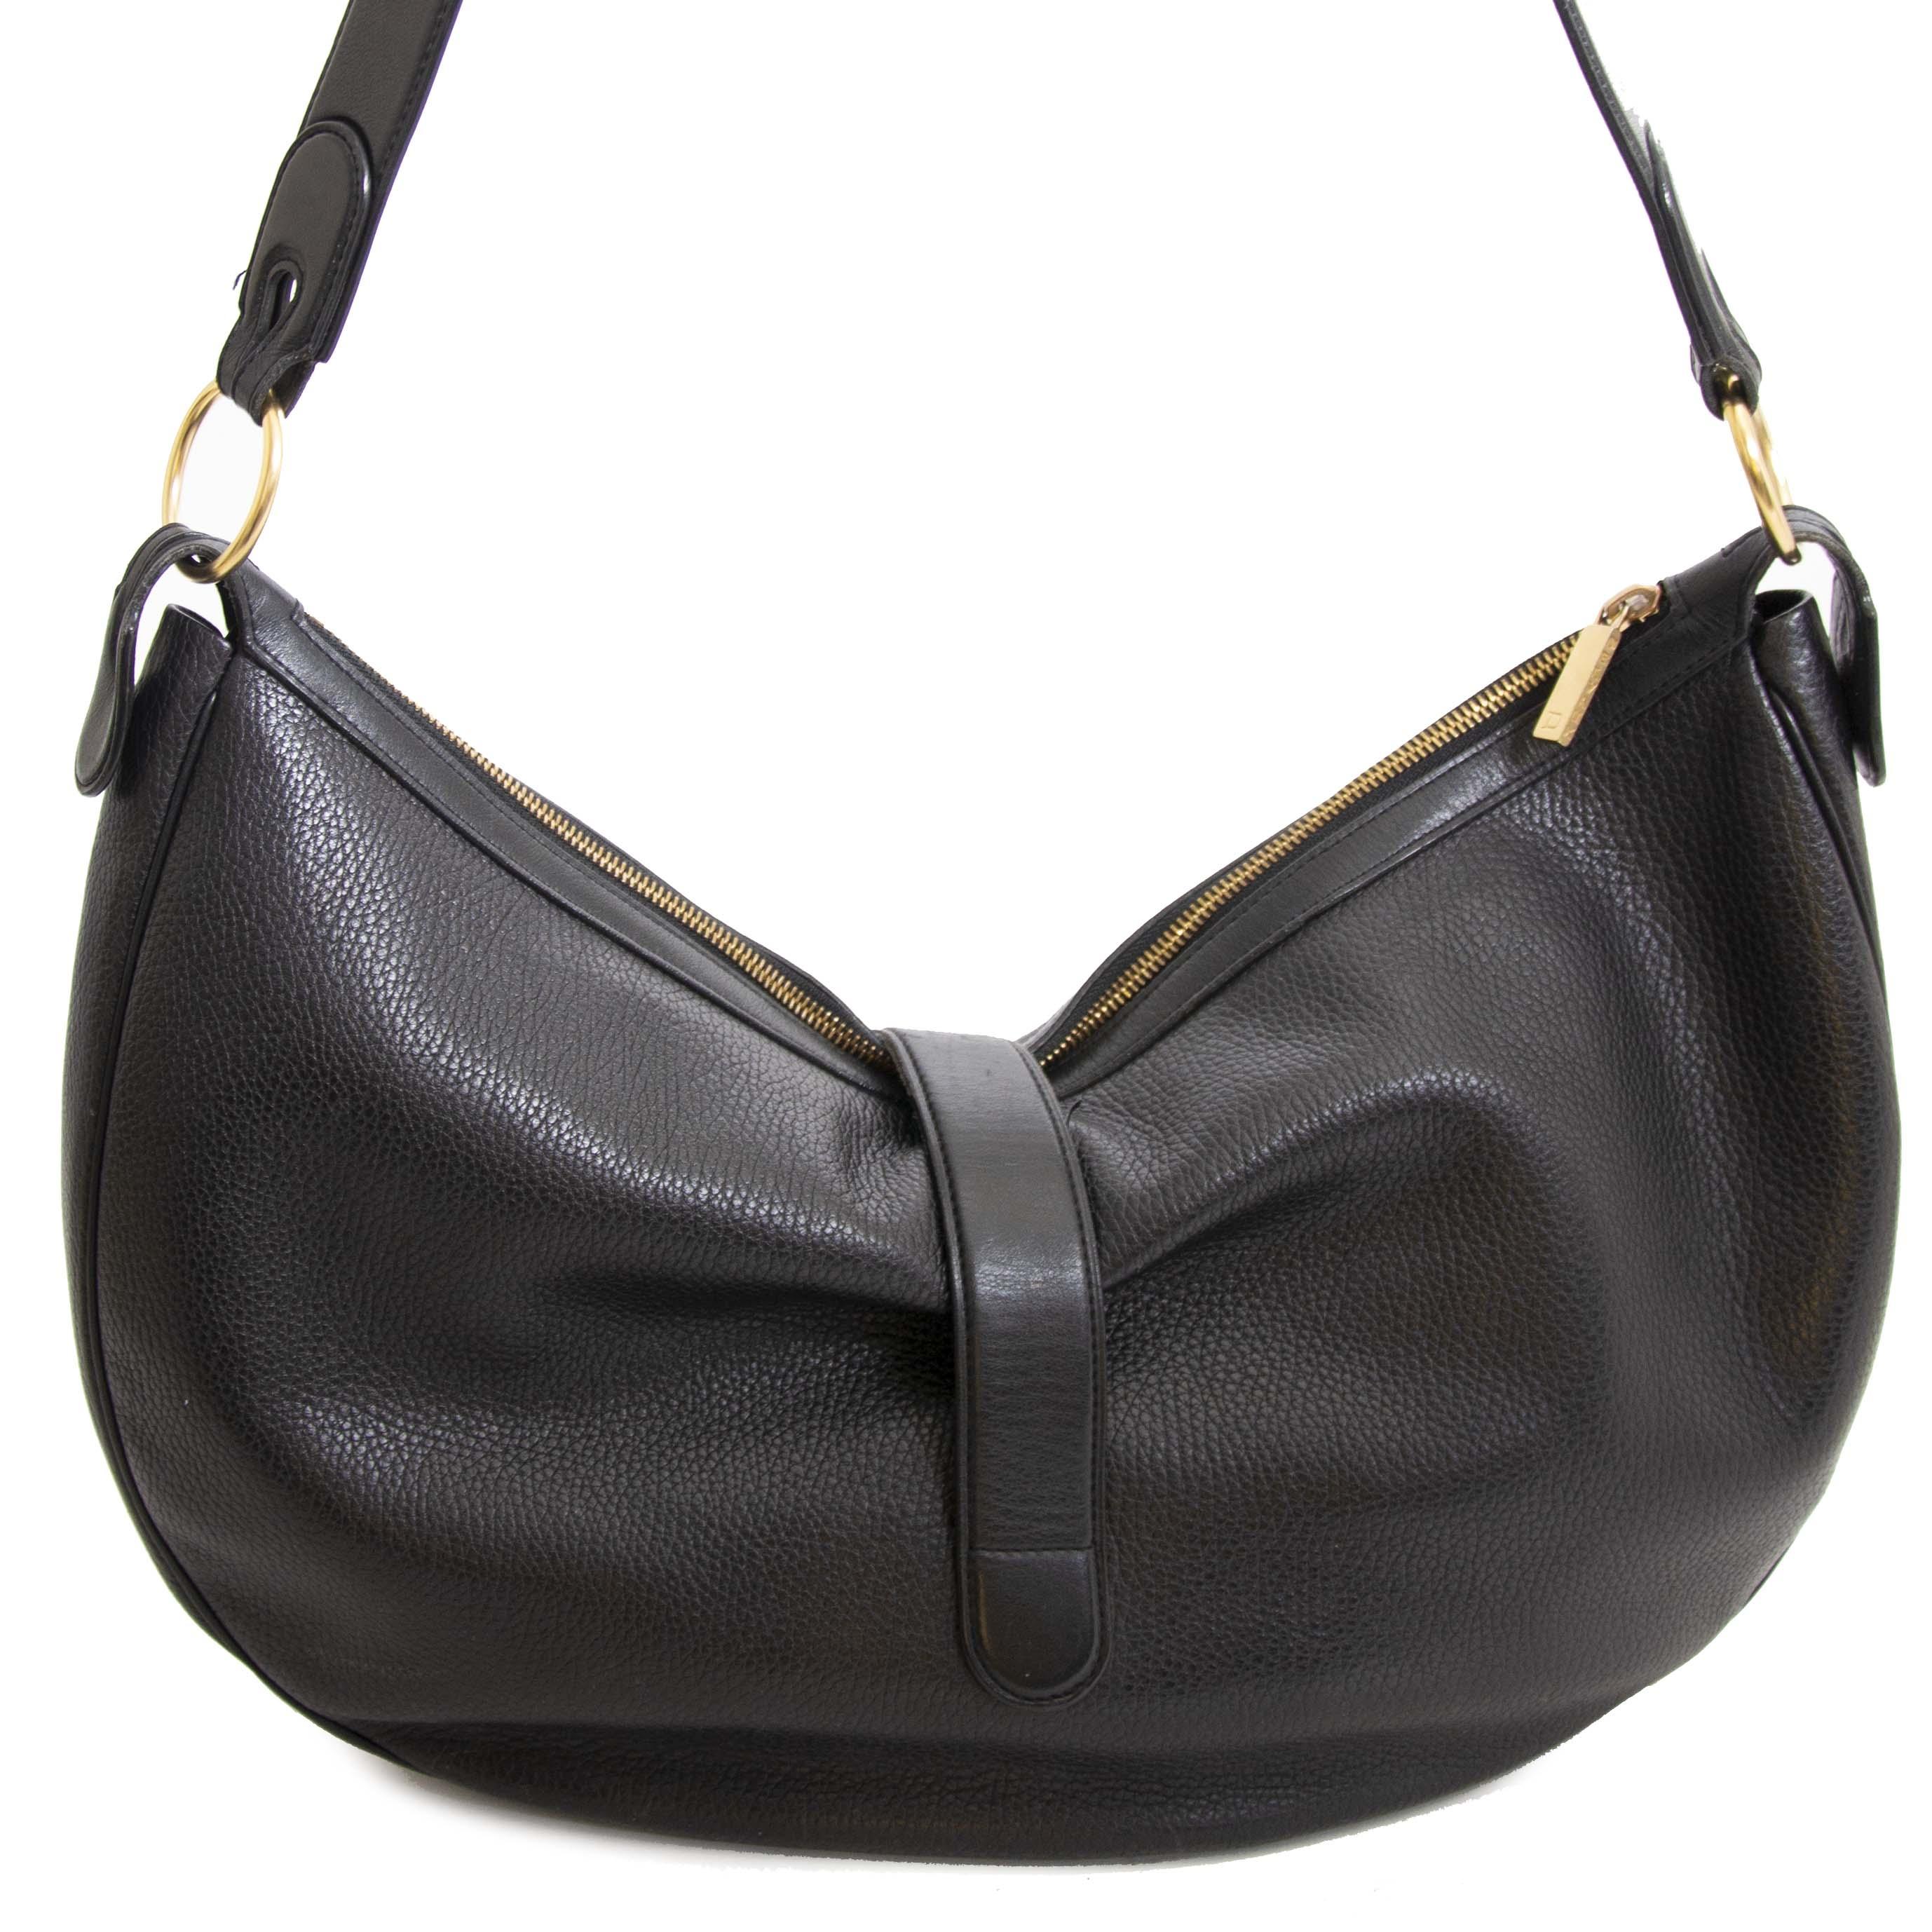 Authentieke tweedehands vintage Delvaux Camille Black Shoulder Bag koop online webshop LabelLOV